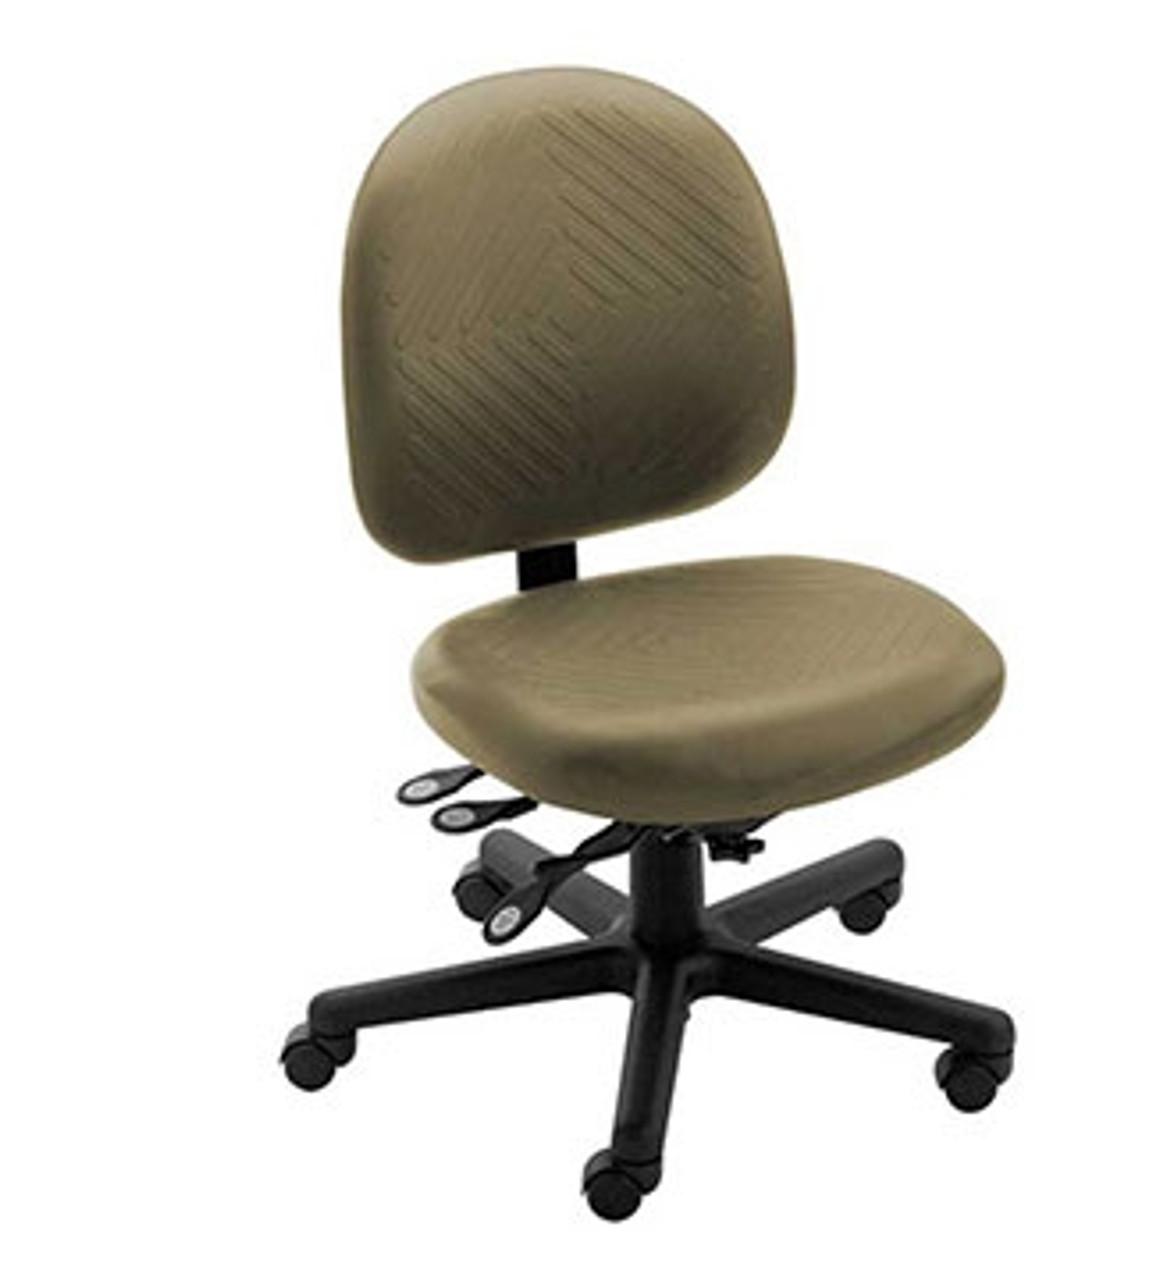 Cramer Chairs